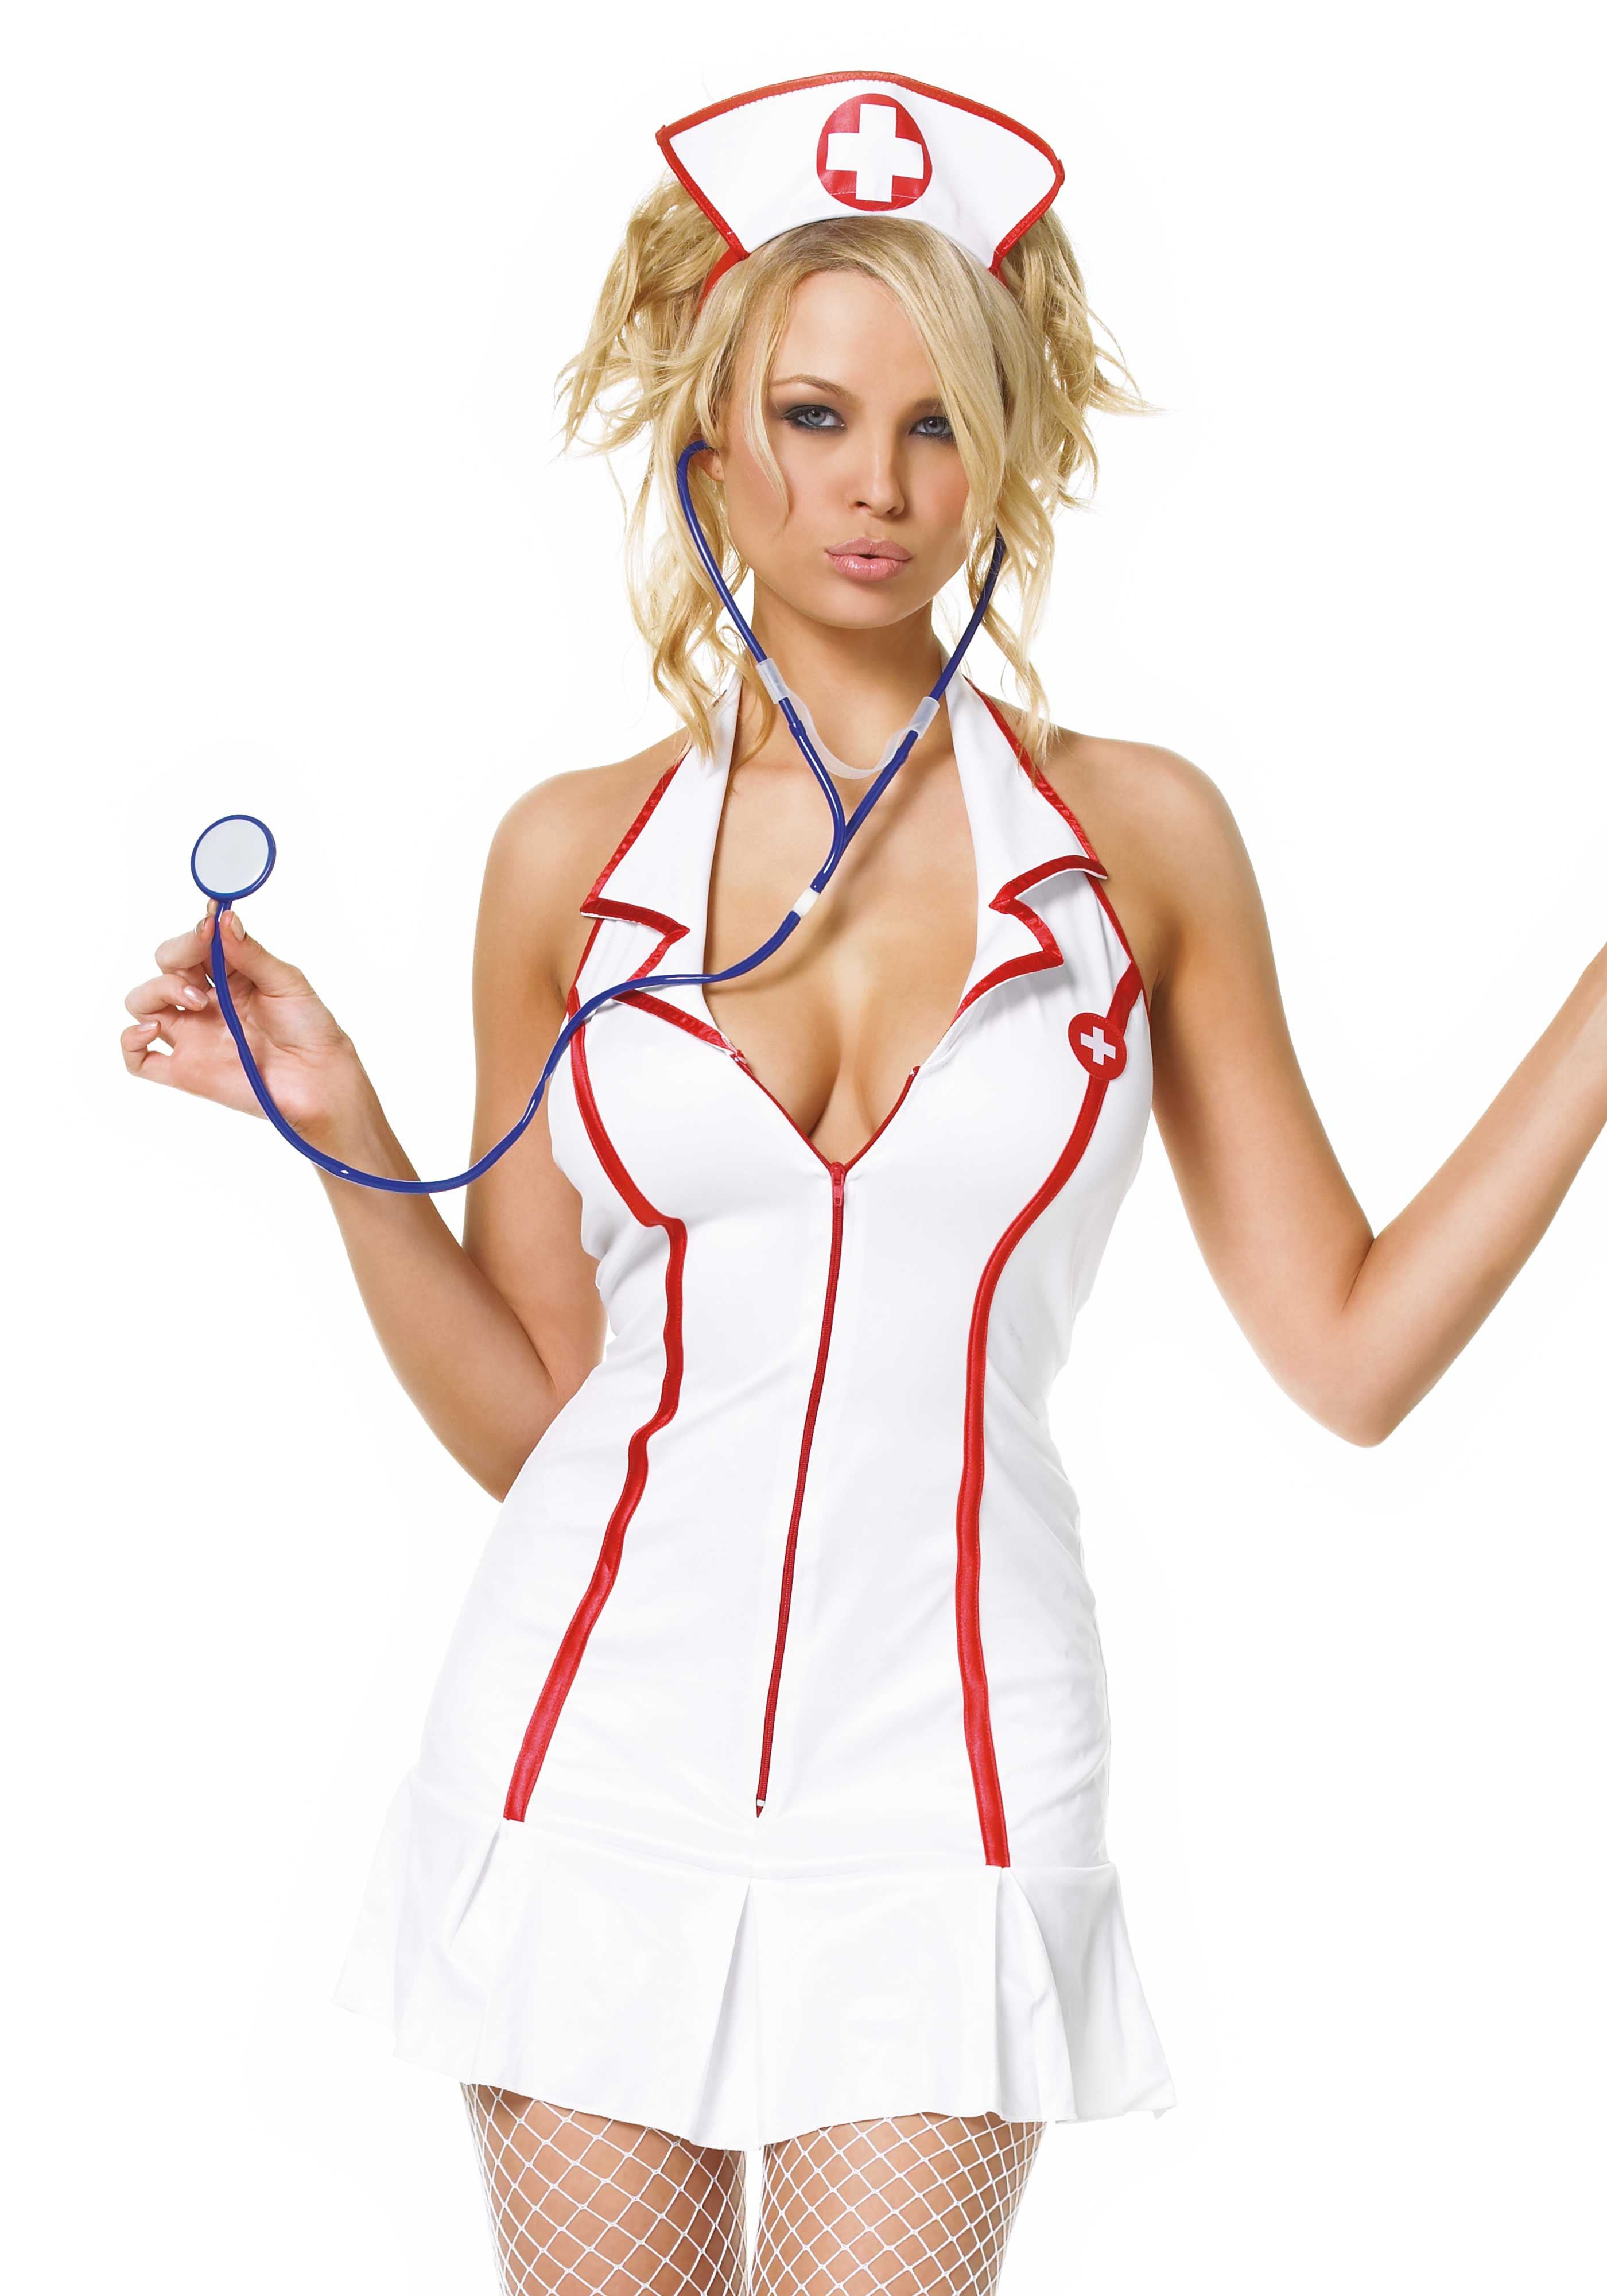 3Pc. Head Nurse Costume Set With Dress, Stethoscope And Headpiece